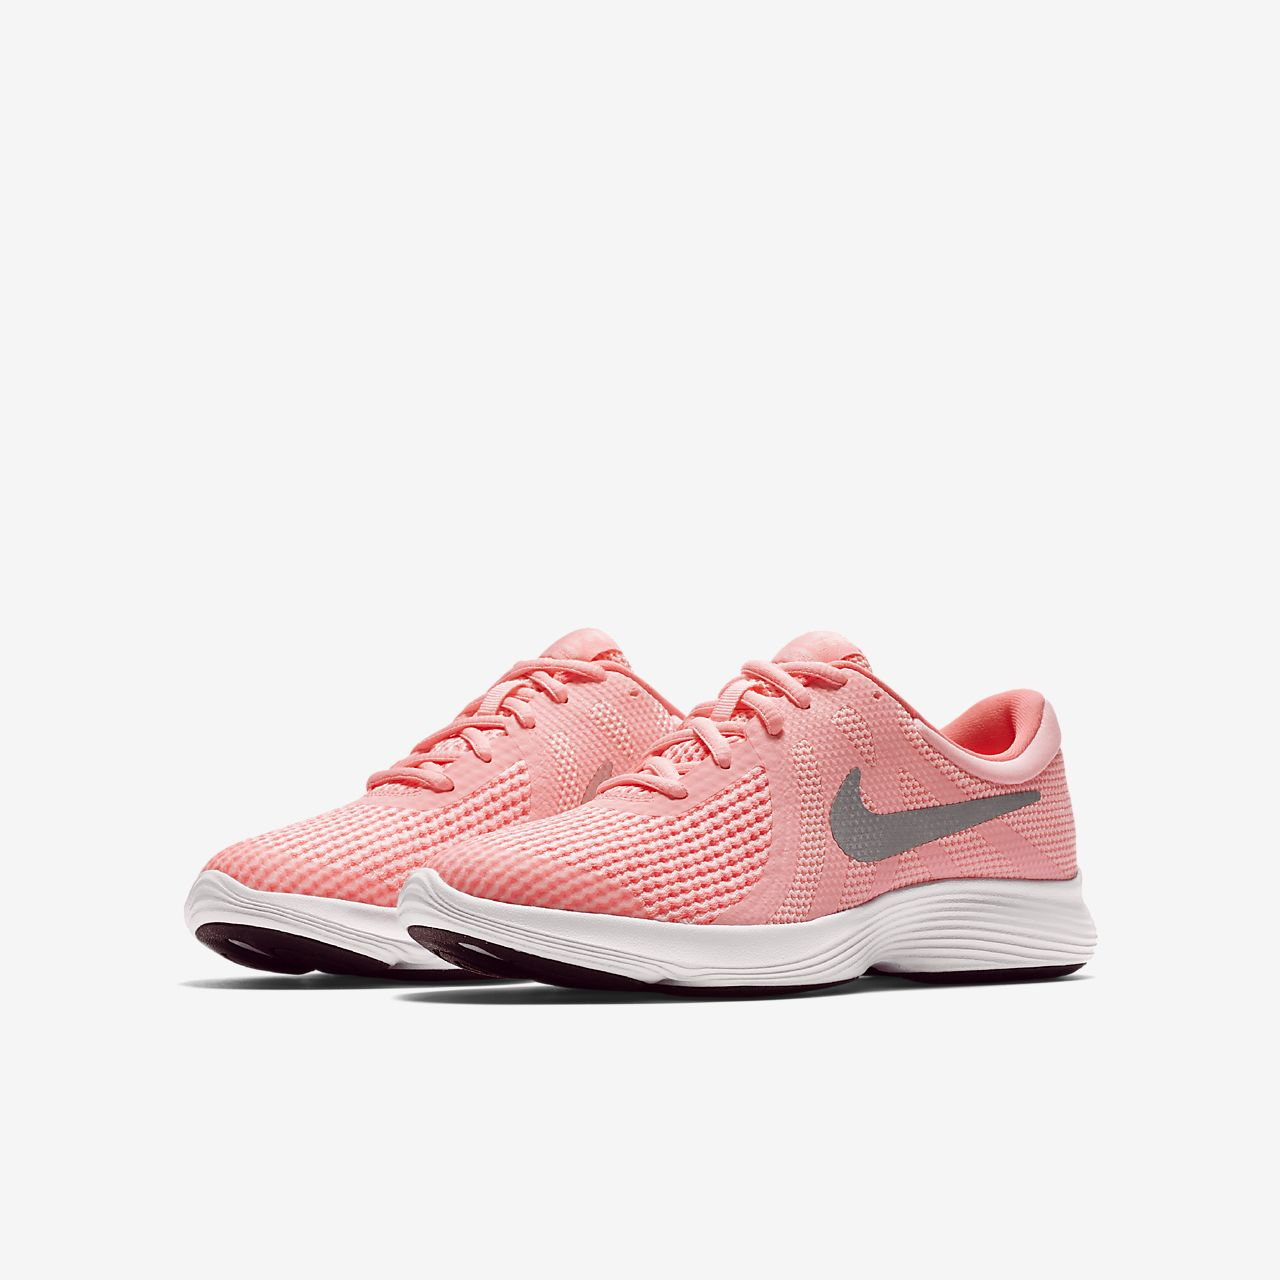 Nike Revolution 4 Big Laufschuh für ältere Kinder - Silver Fez57tVkg